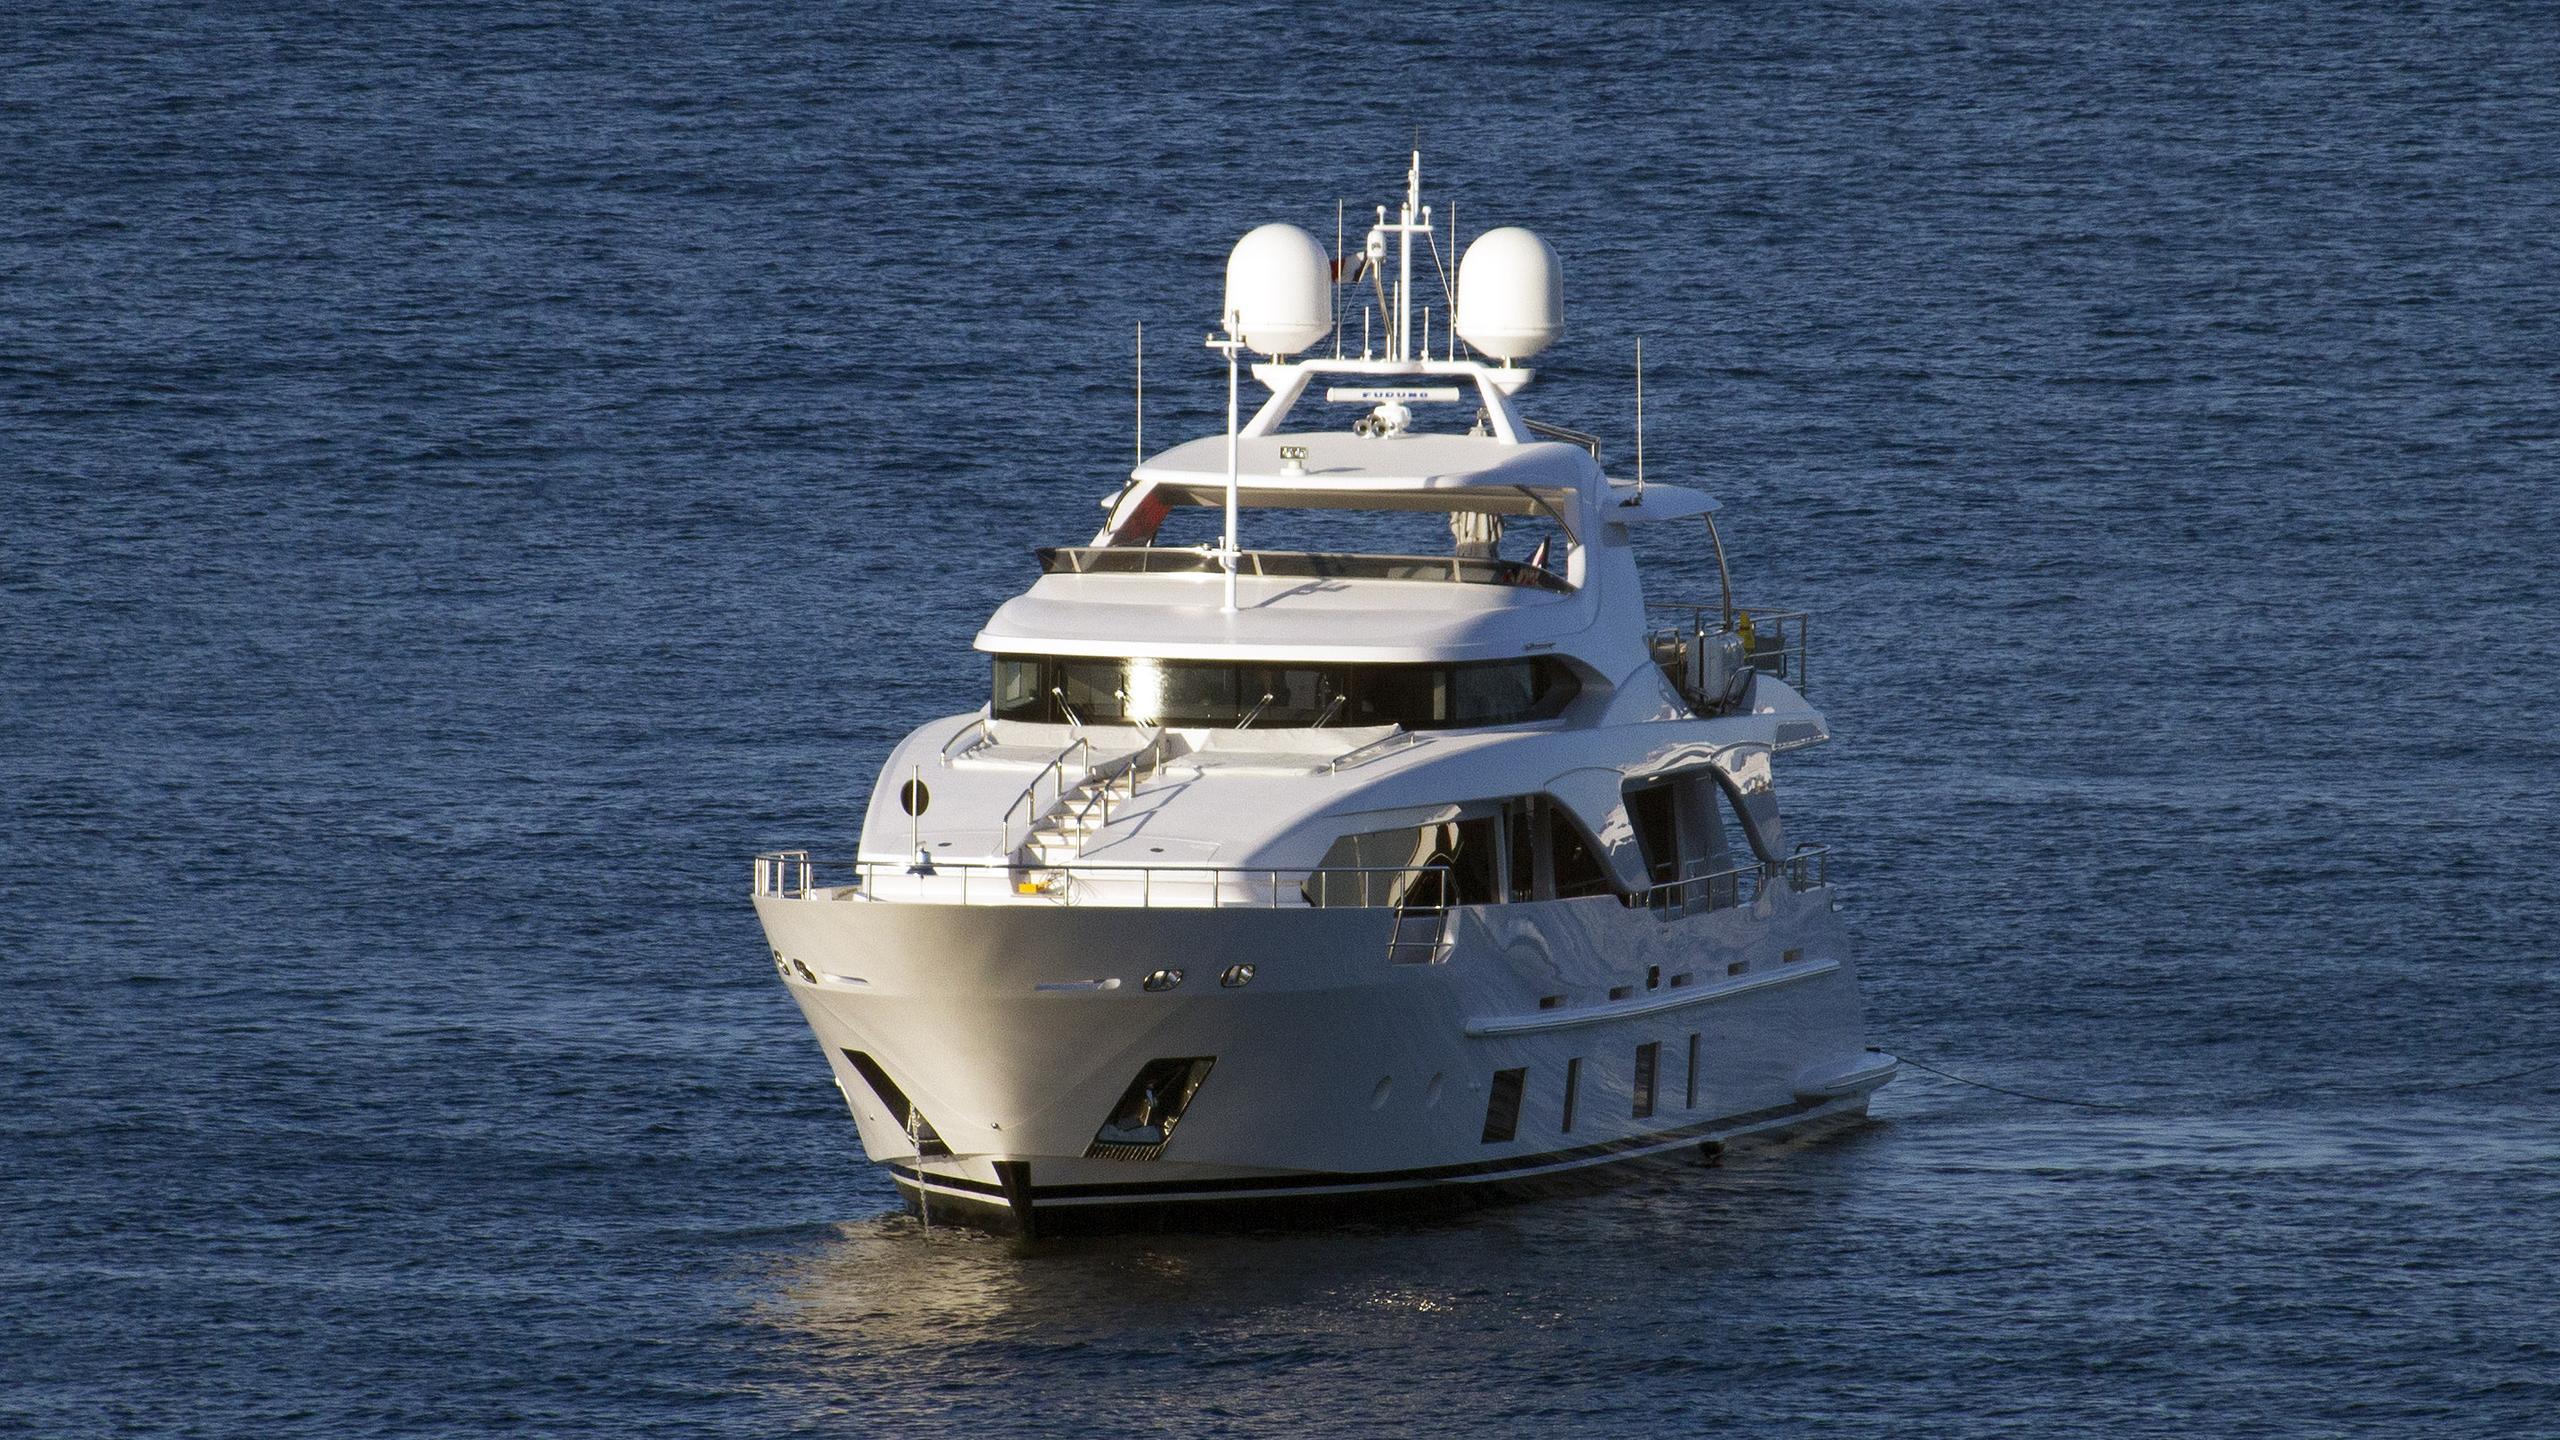 novastar-motor-yacht-benetti-2015-28m-bow